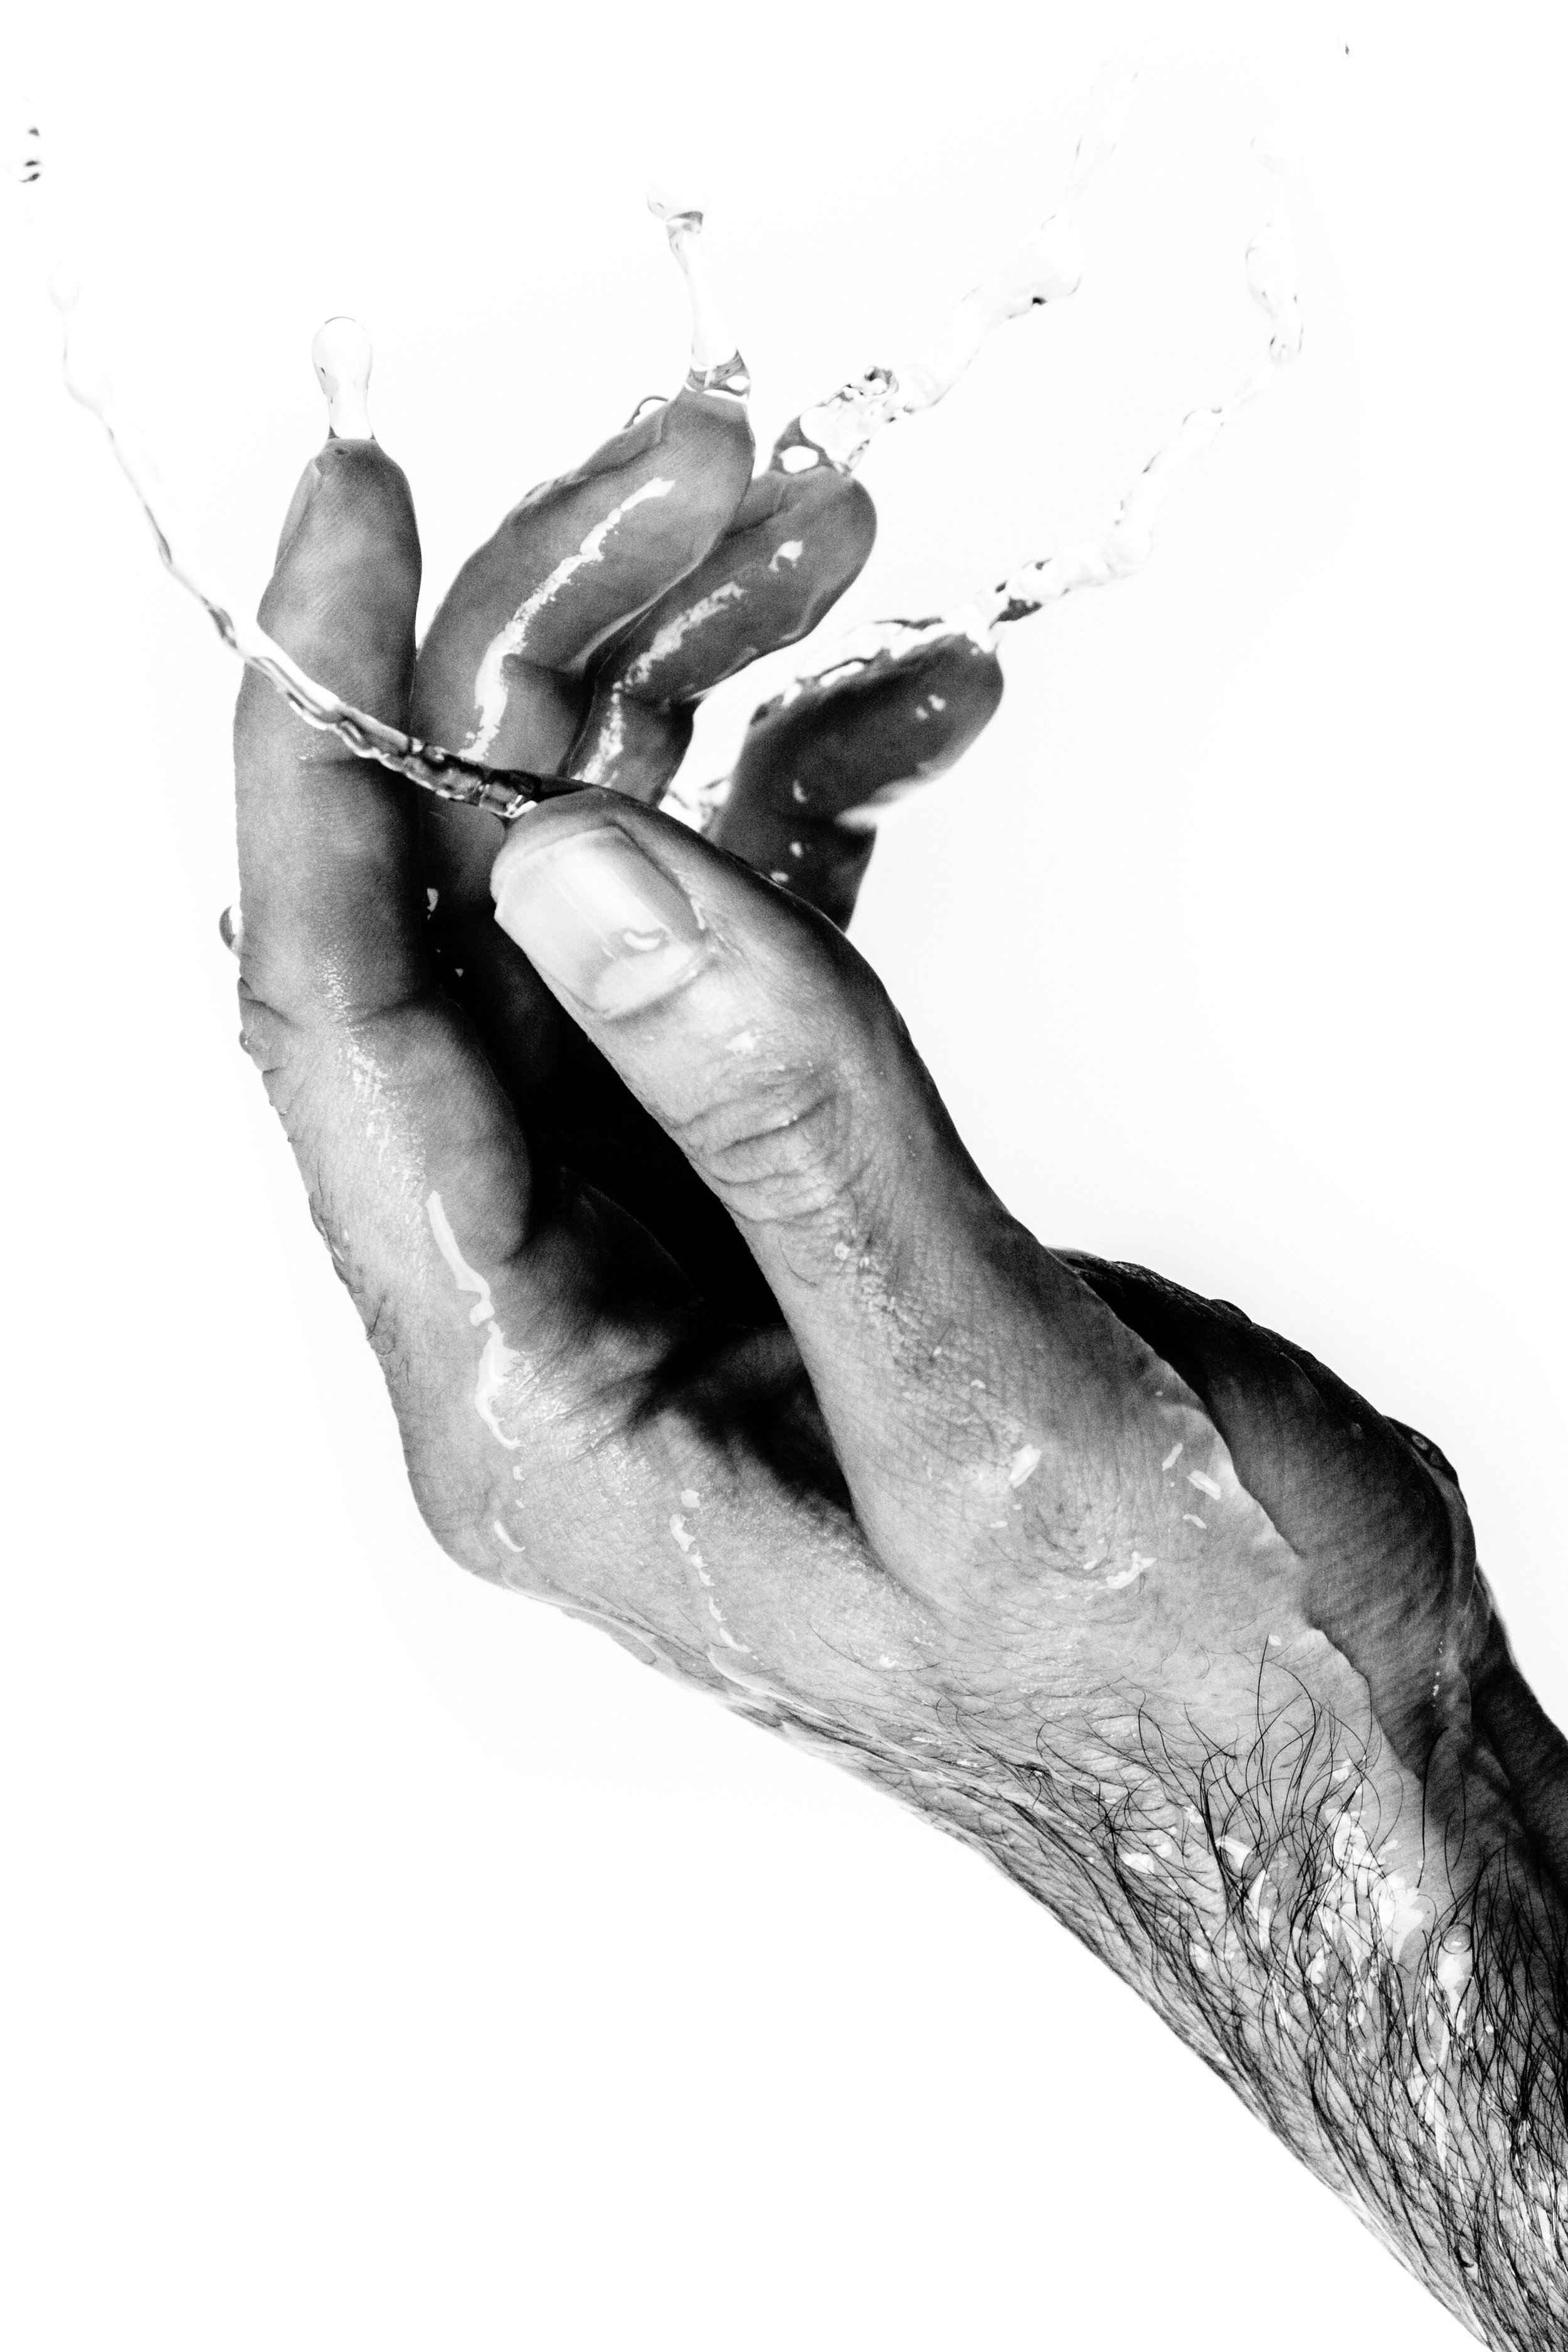 The_Hand_Water_Web-3.jpg